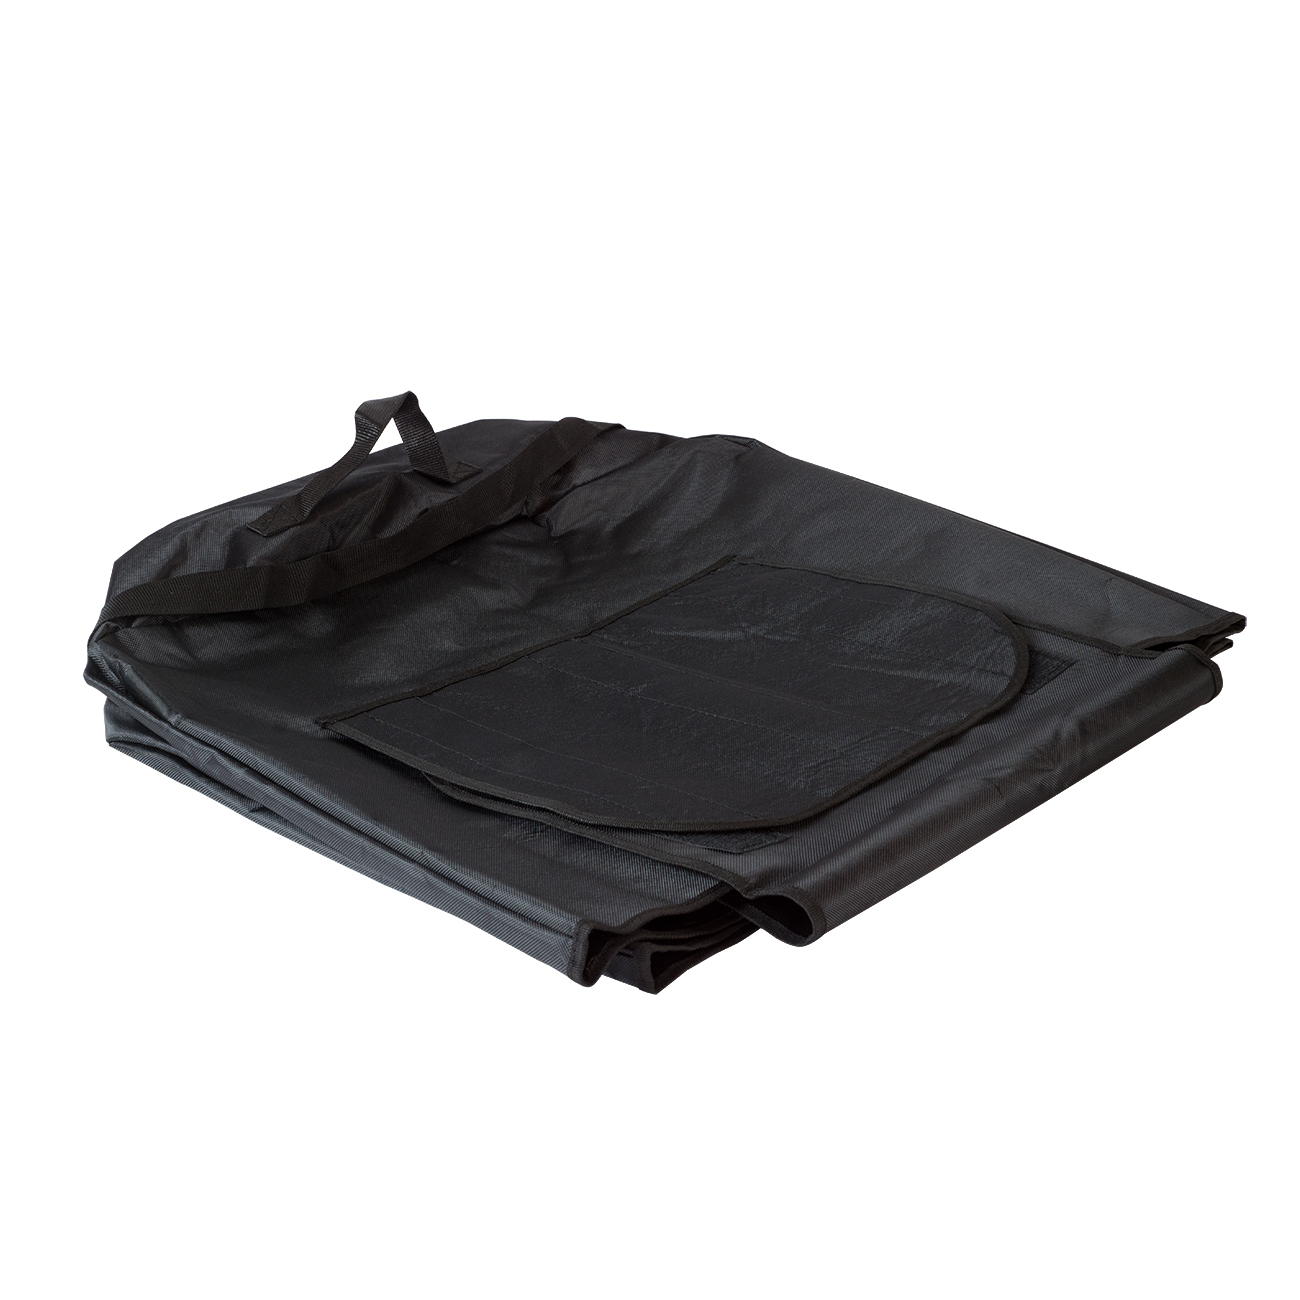 ergoflix® Transporttasche M/L/Lplus